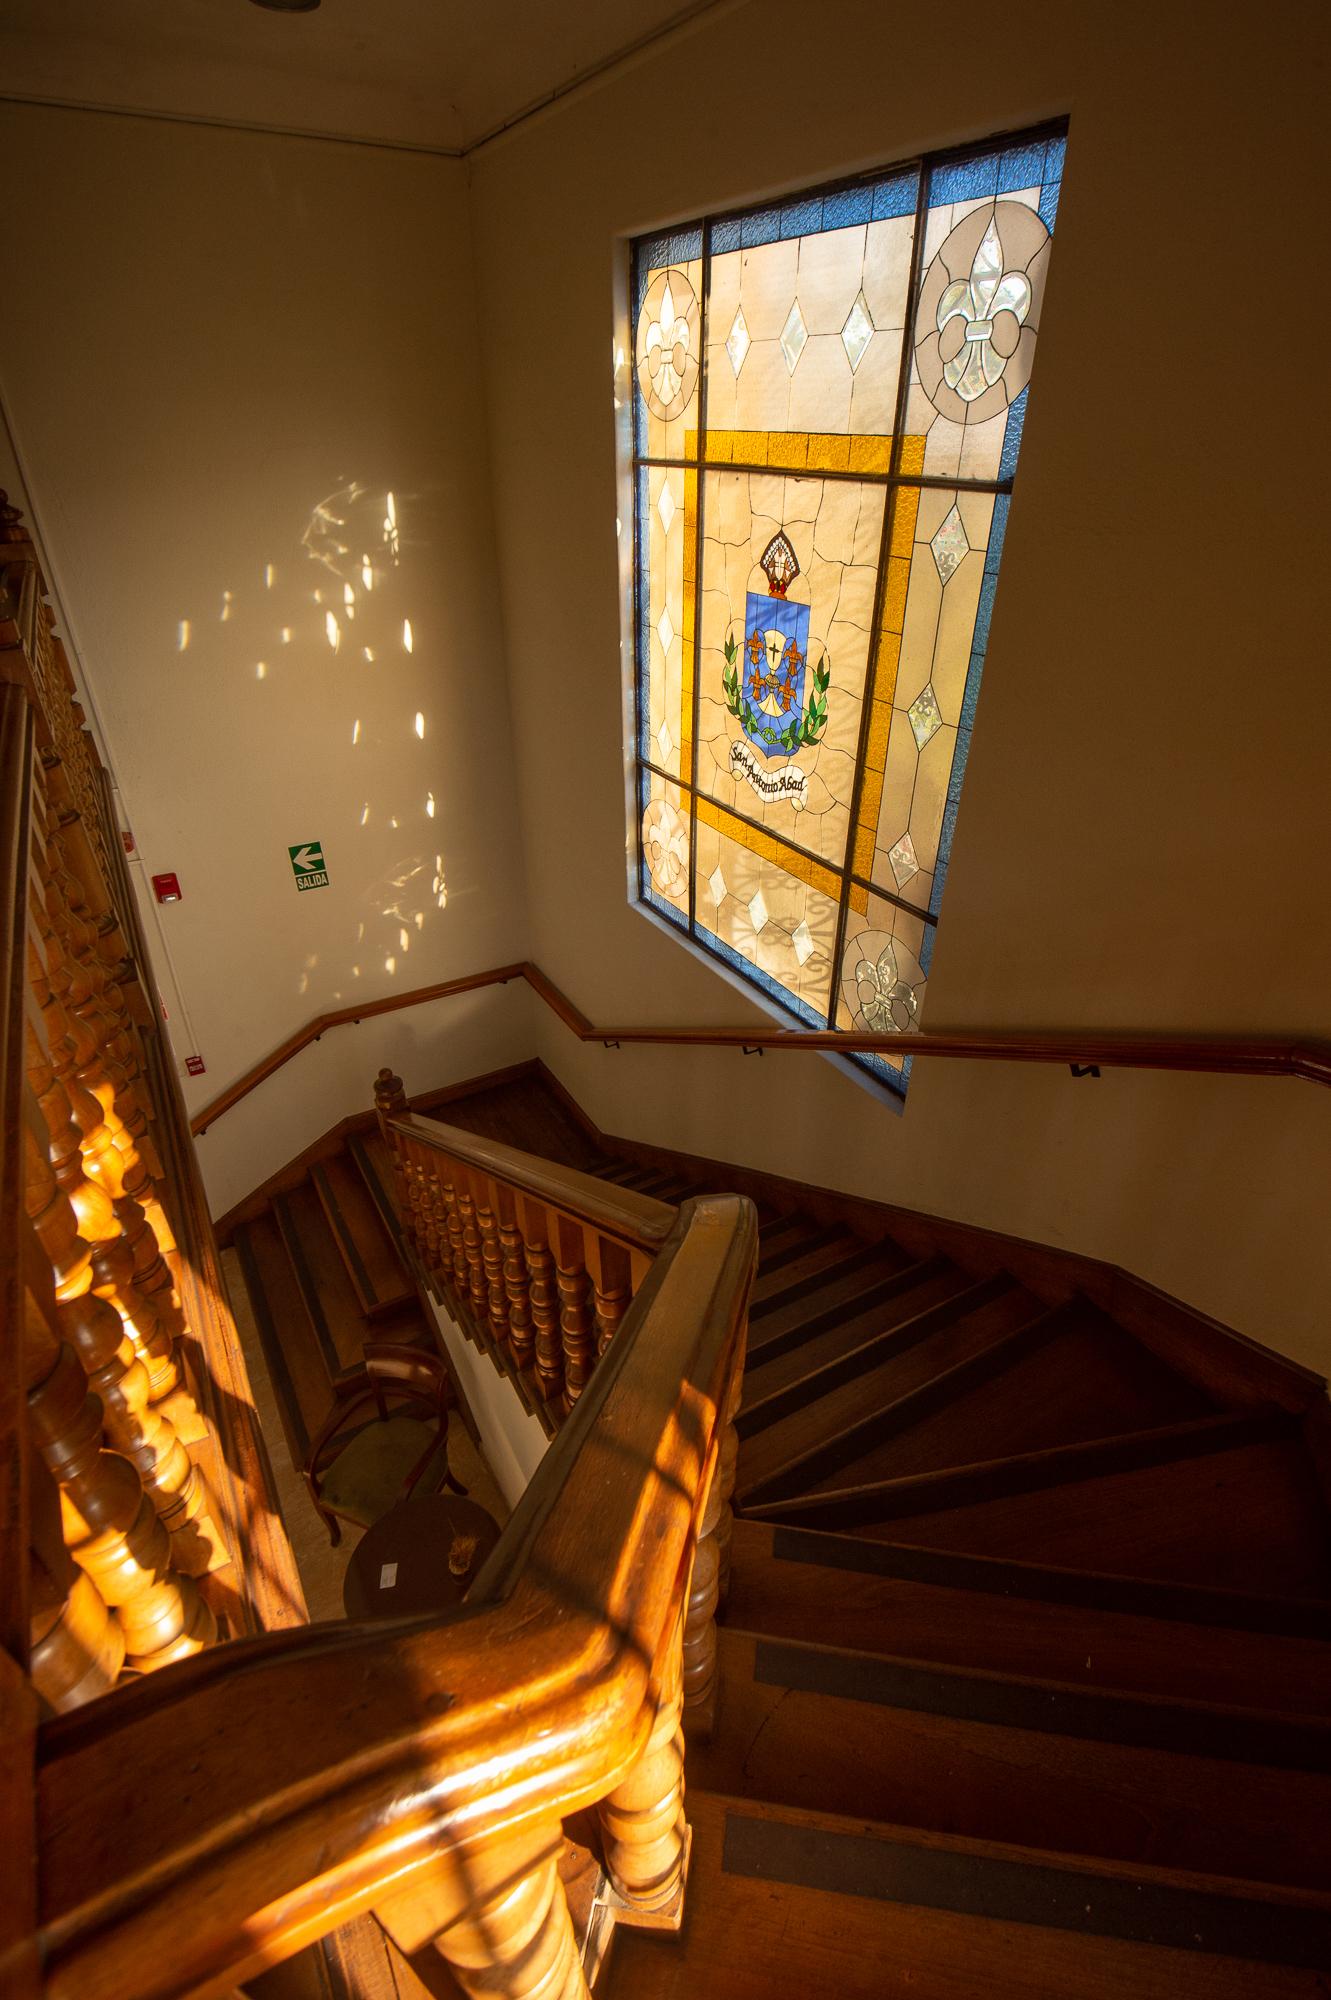 Hotel San Antonio Abad - Stairs